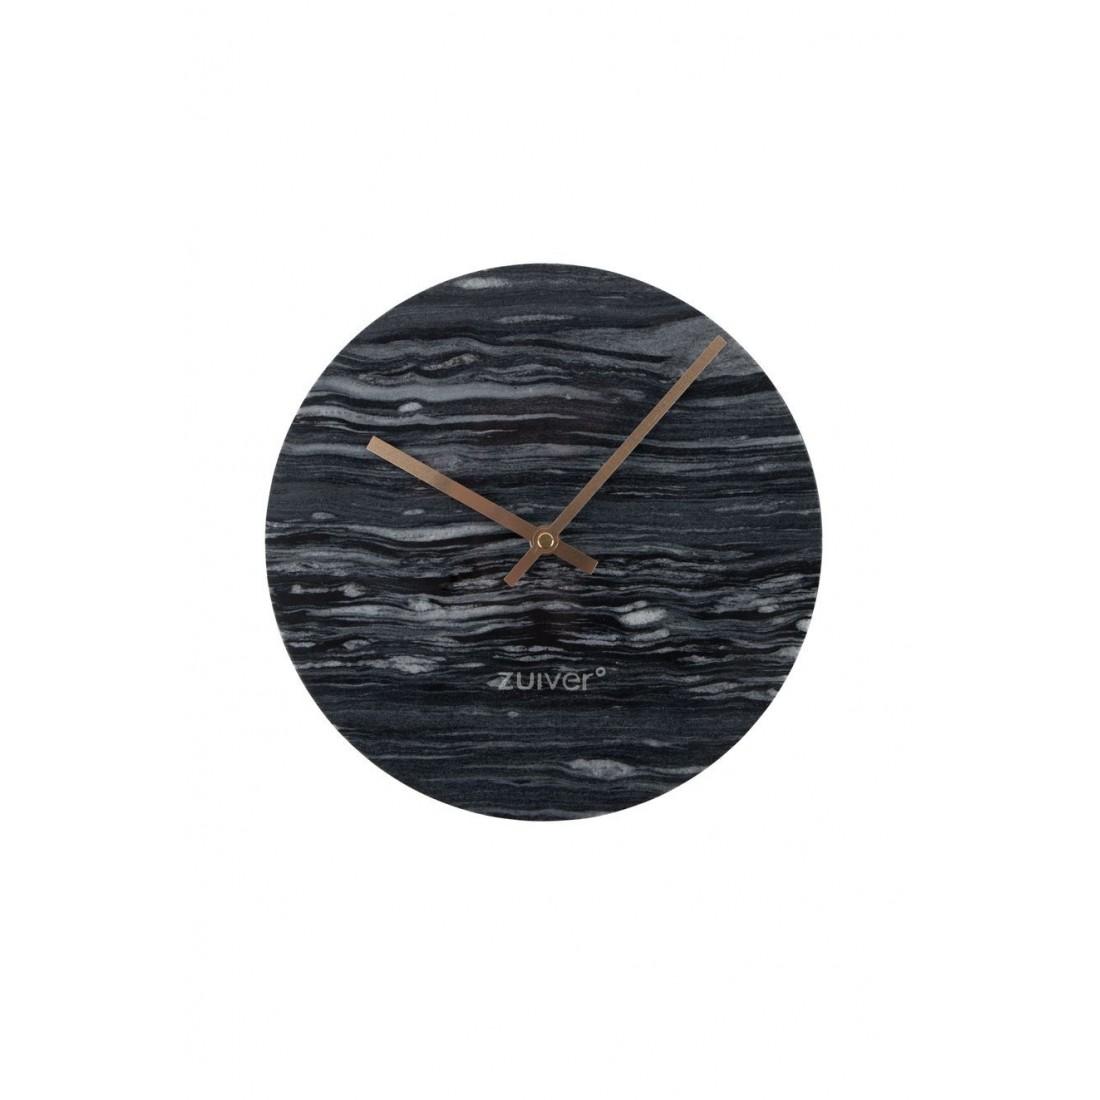 Horloge Marbre Gris Zuiver